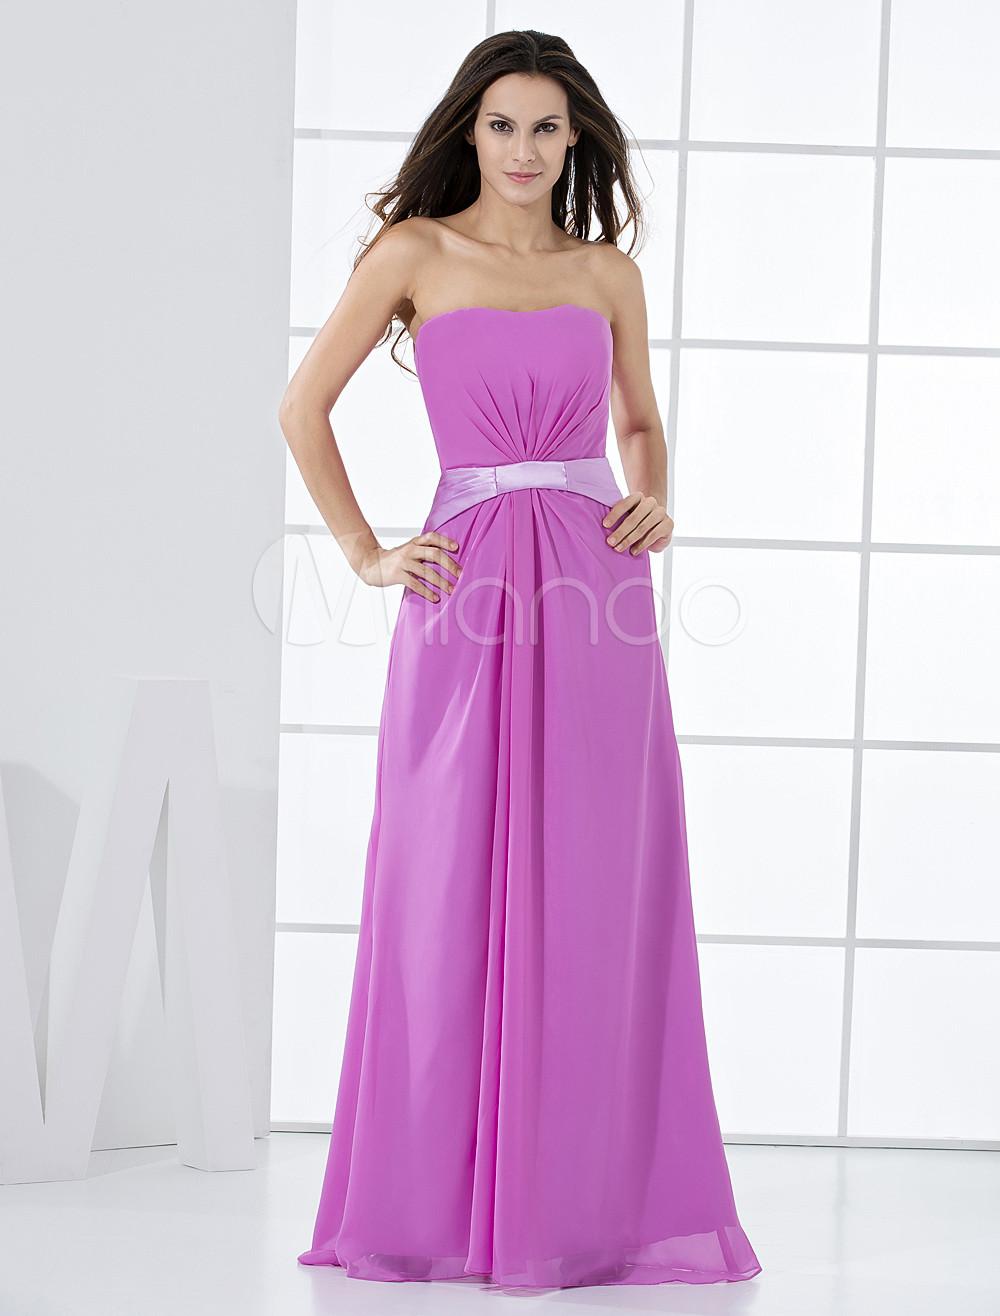 Lilac Chiffon Strapless A-line Floor Length Bridesmaid Dress